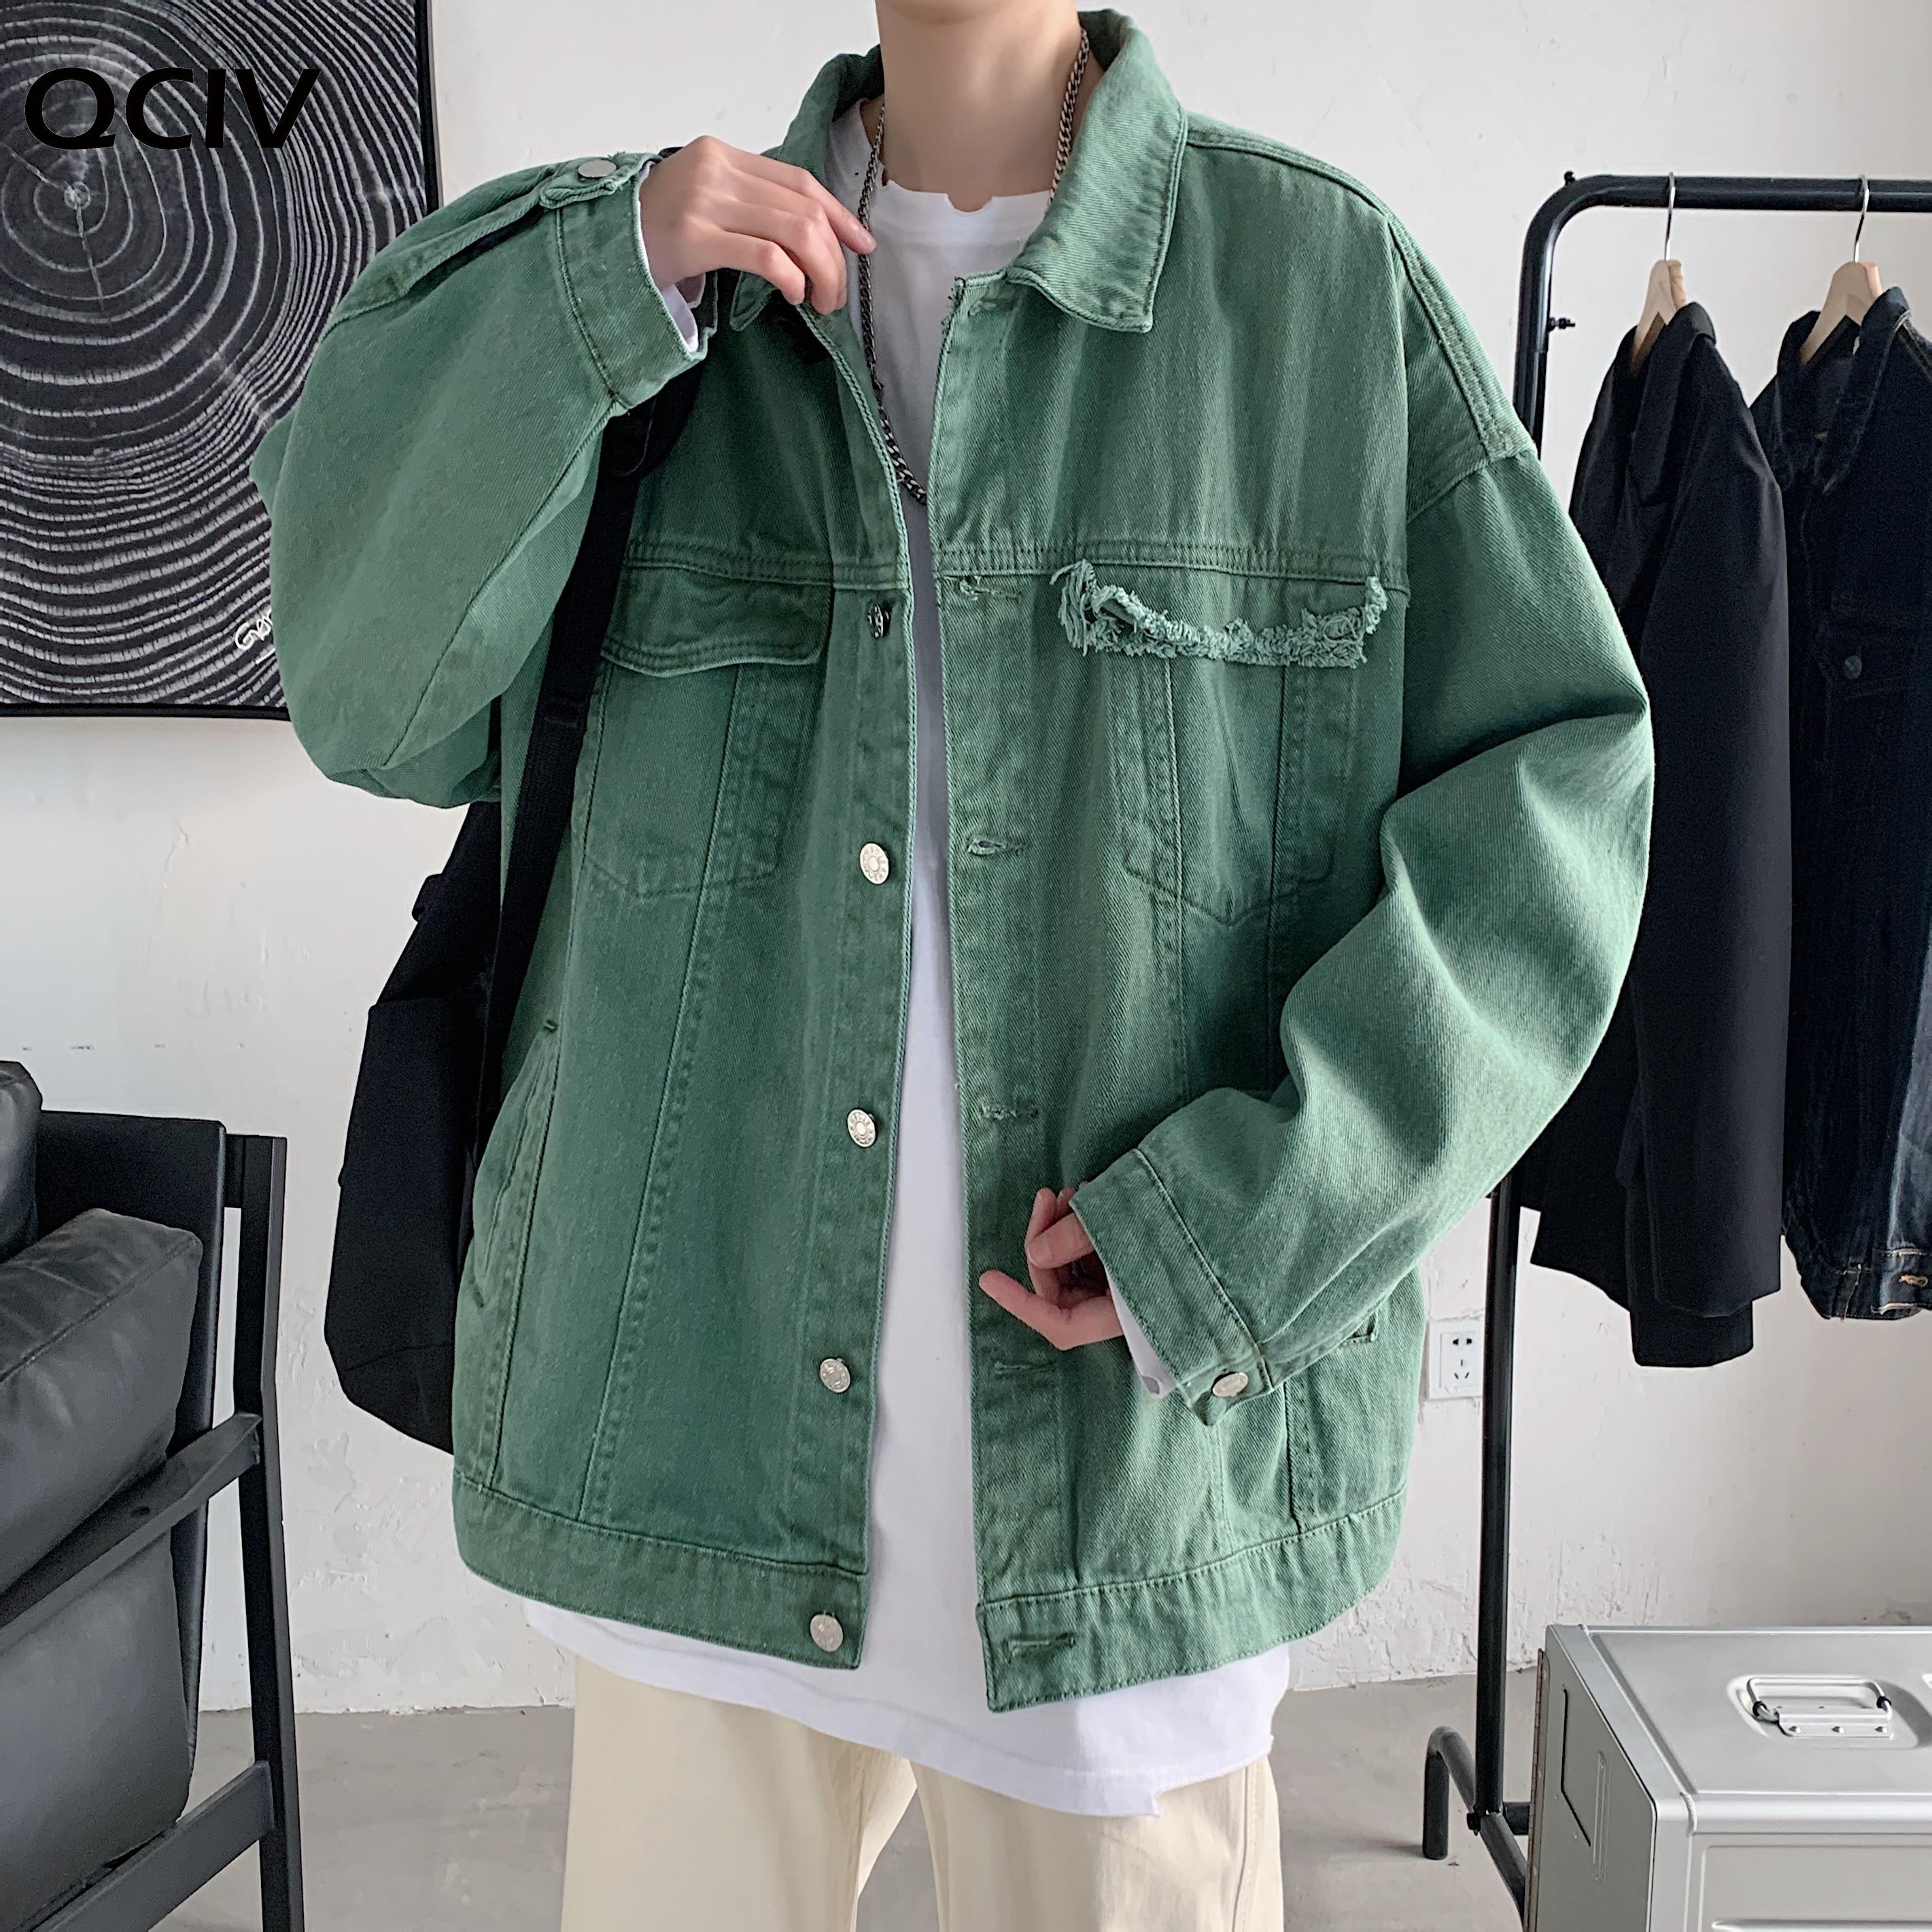 Spring Autumn Men Denim Jackets Korean Solid Hole Streetwear Leisure Jean Jacket Khaki/Black/Army green Fashion Jeans Coat